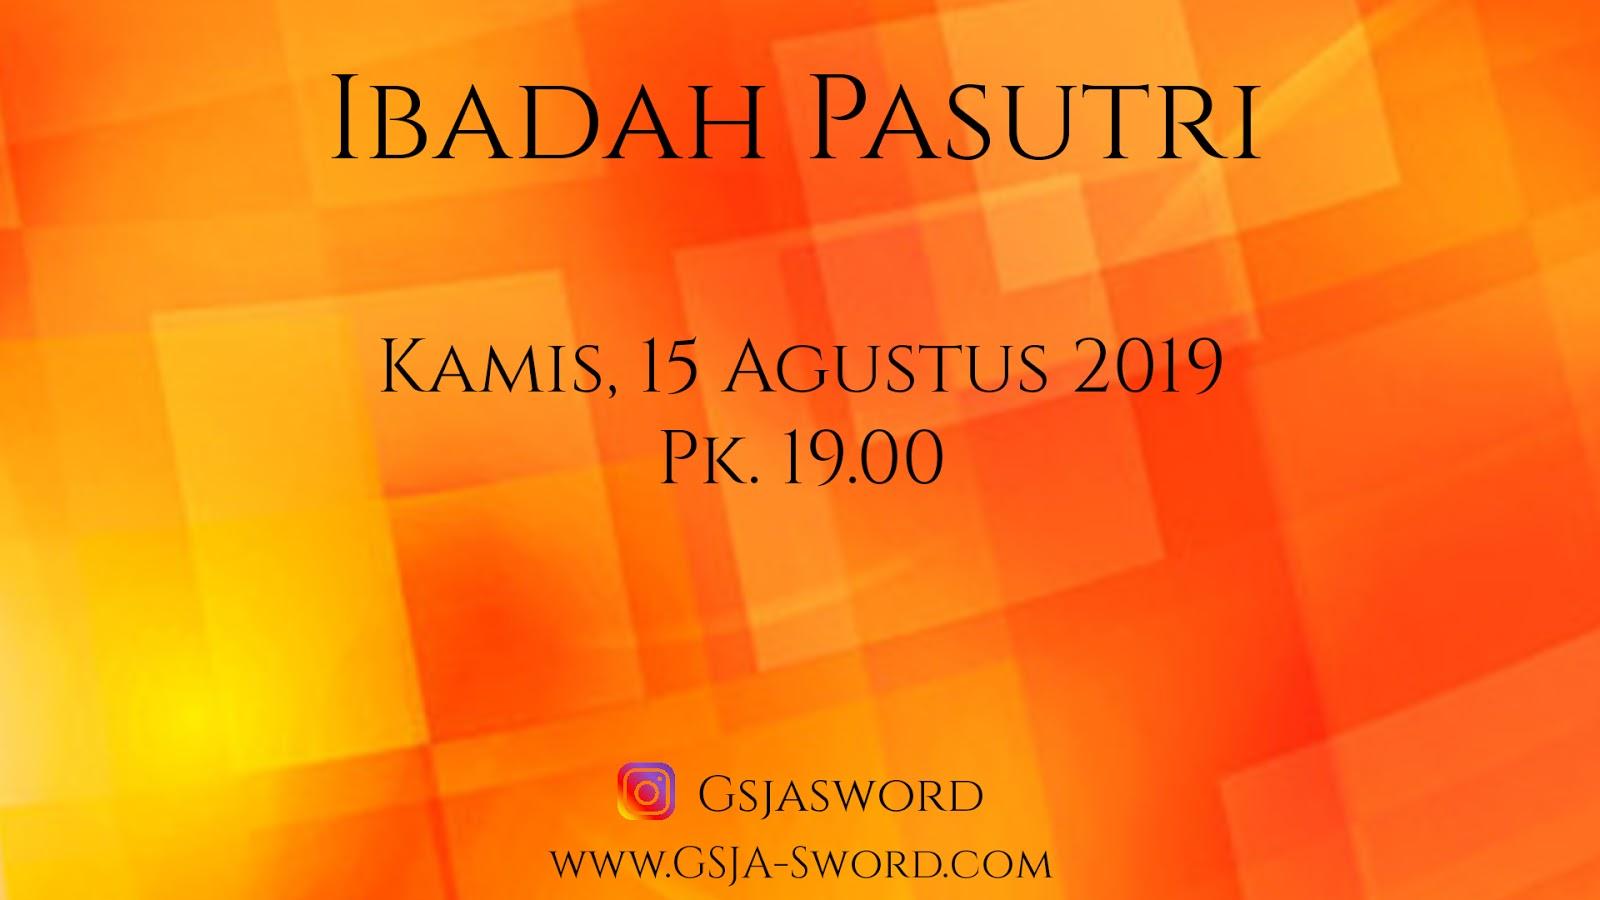 Ibadah Pasutri GSJA Sword 15 Agustus 2019